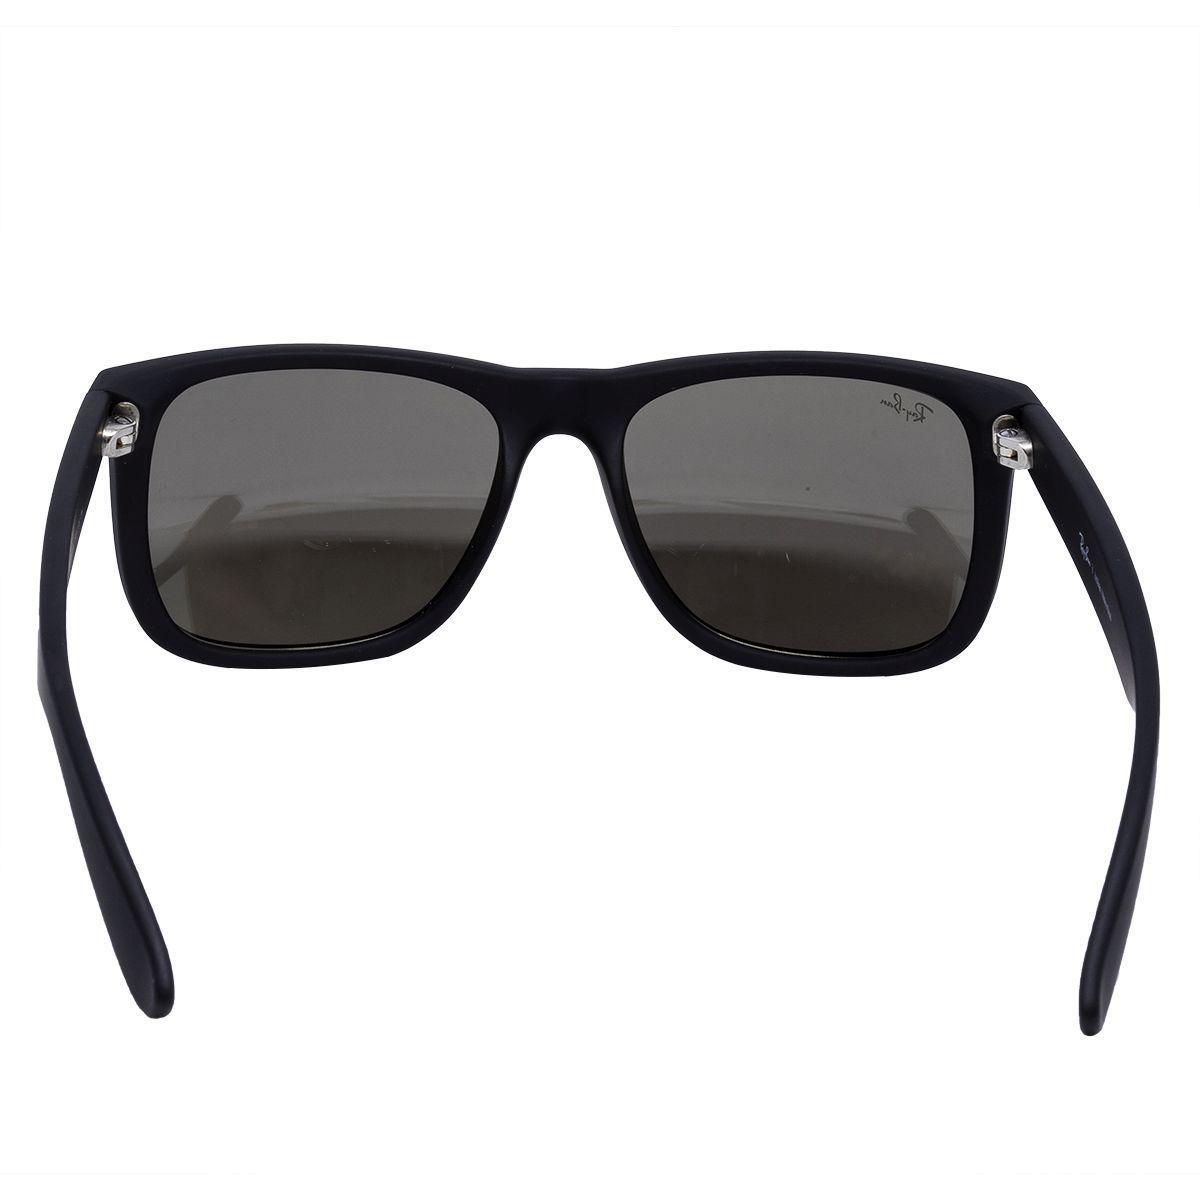 d6550345a Óculos de Sol Ray Ban Justin Rubber Black RB4165 622/5A - Acetato Preto,  Lente Espelhada Dourada R$ 400,00 à vista. Adicionar à sacola